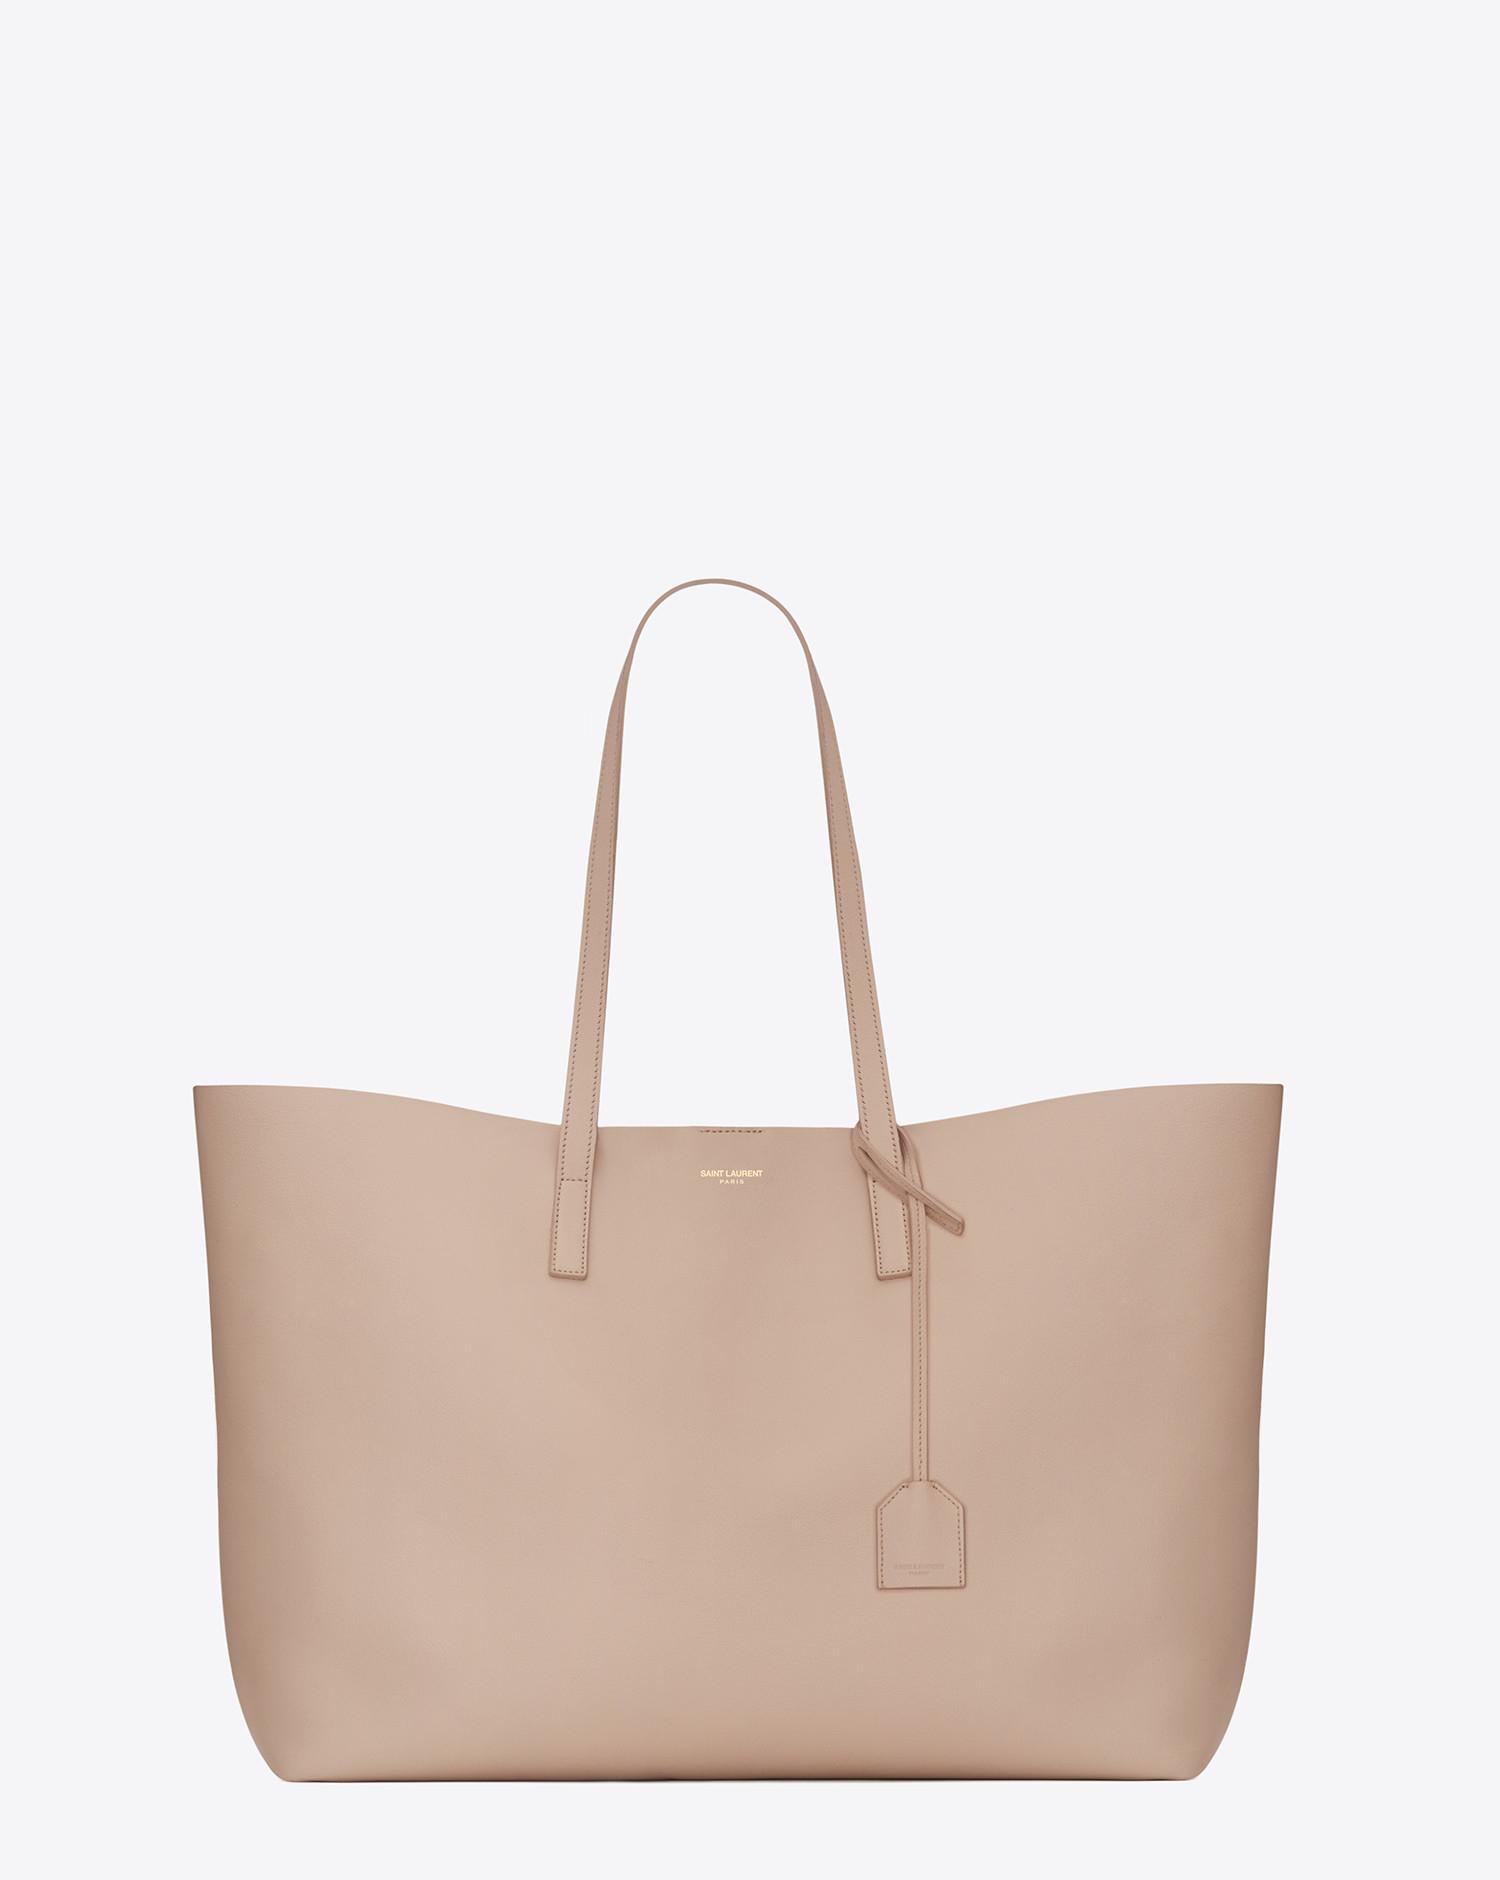 9ff0f60cb2e0 Lyst - Saint Laurent Large Shopping Tote Bag In Pale Blush .